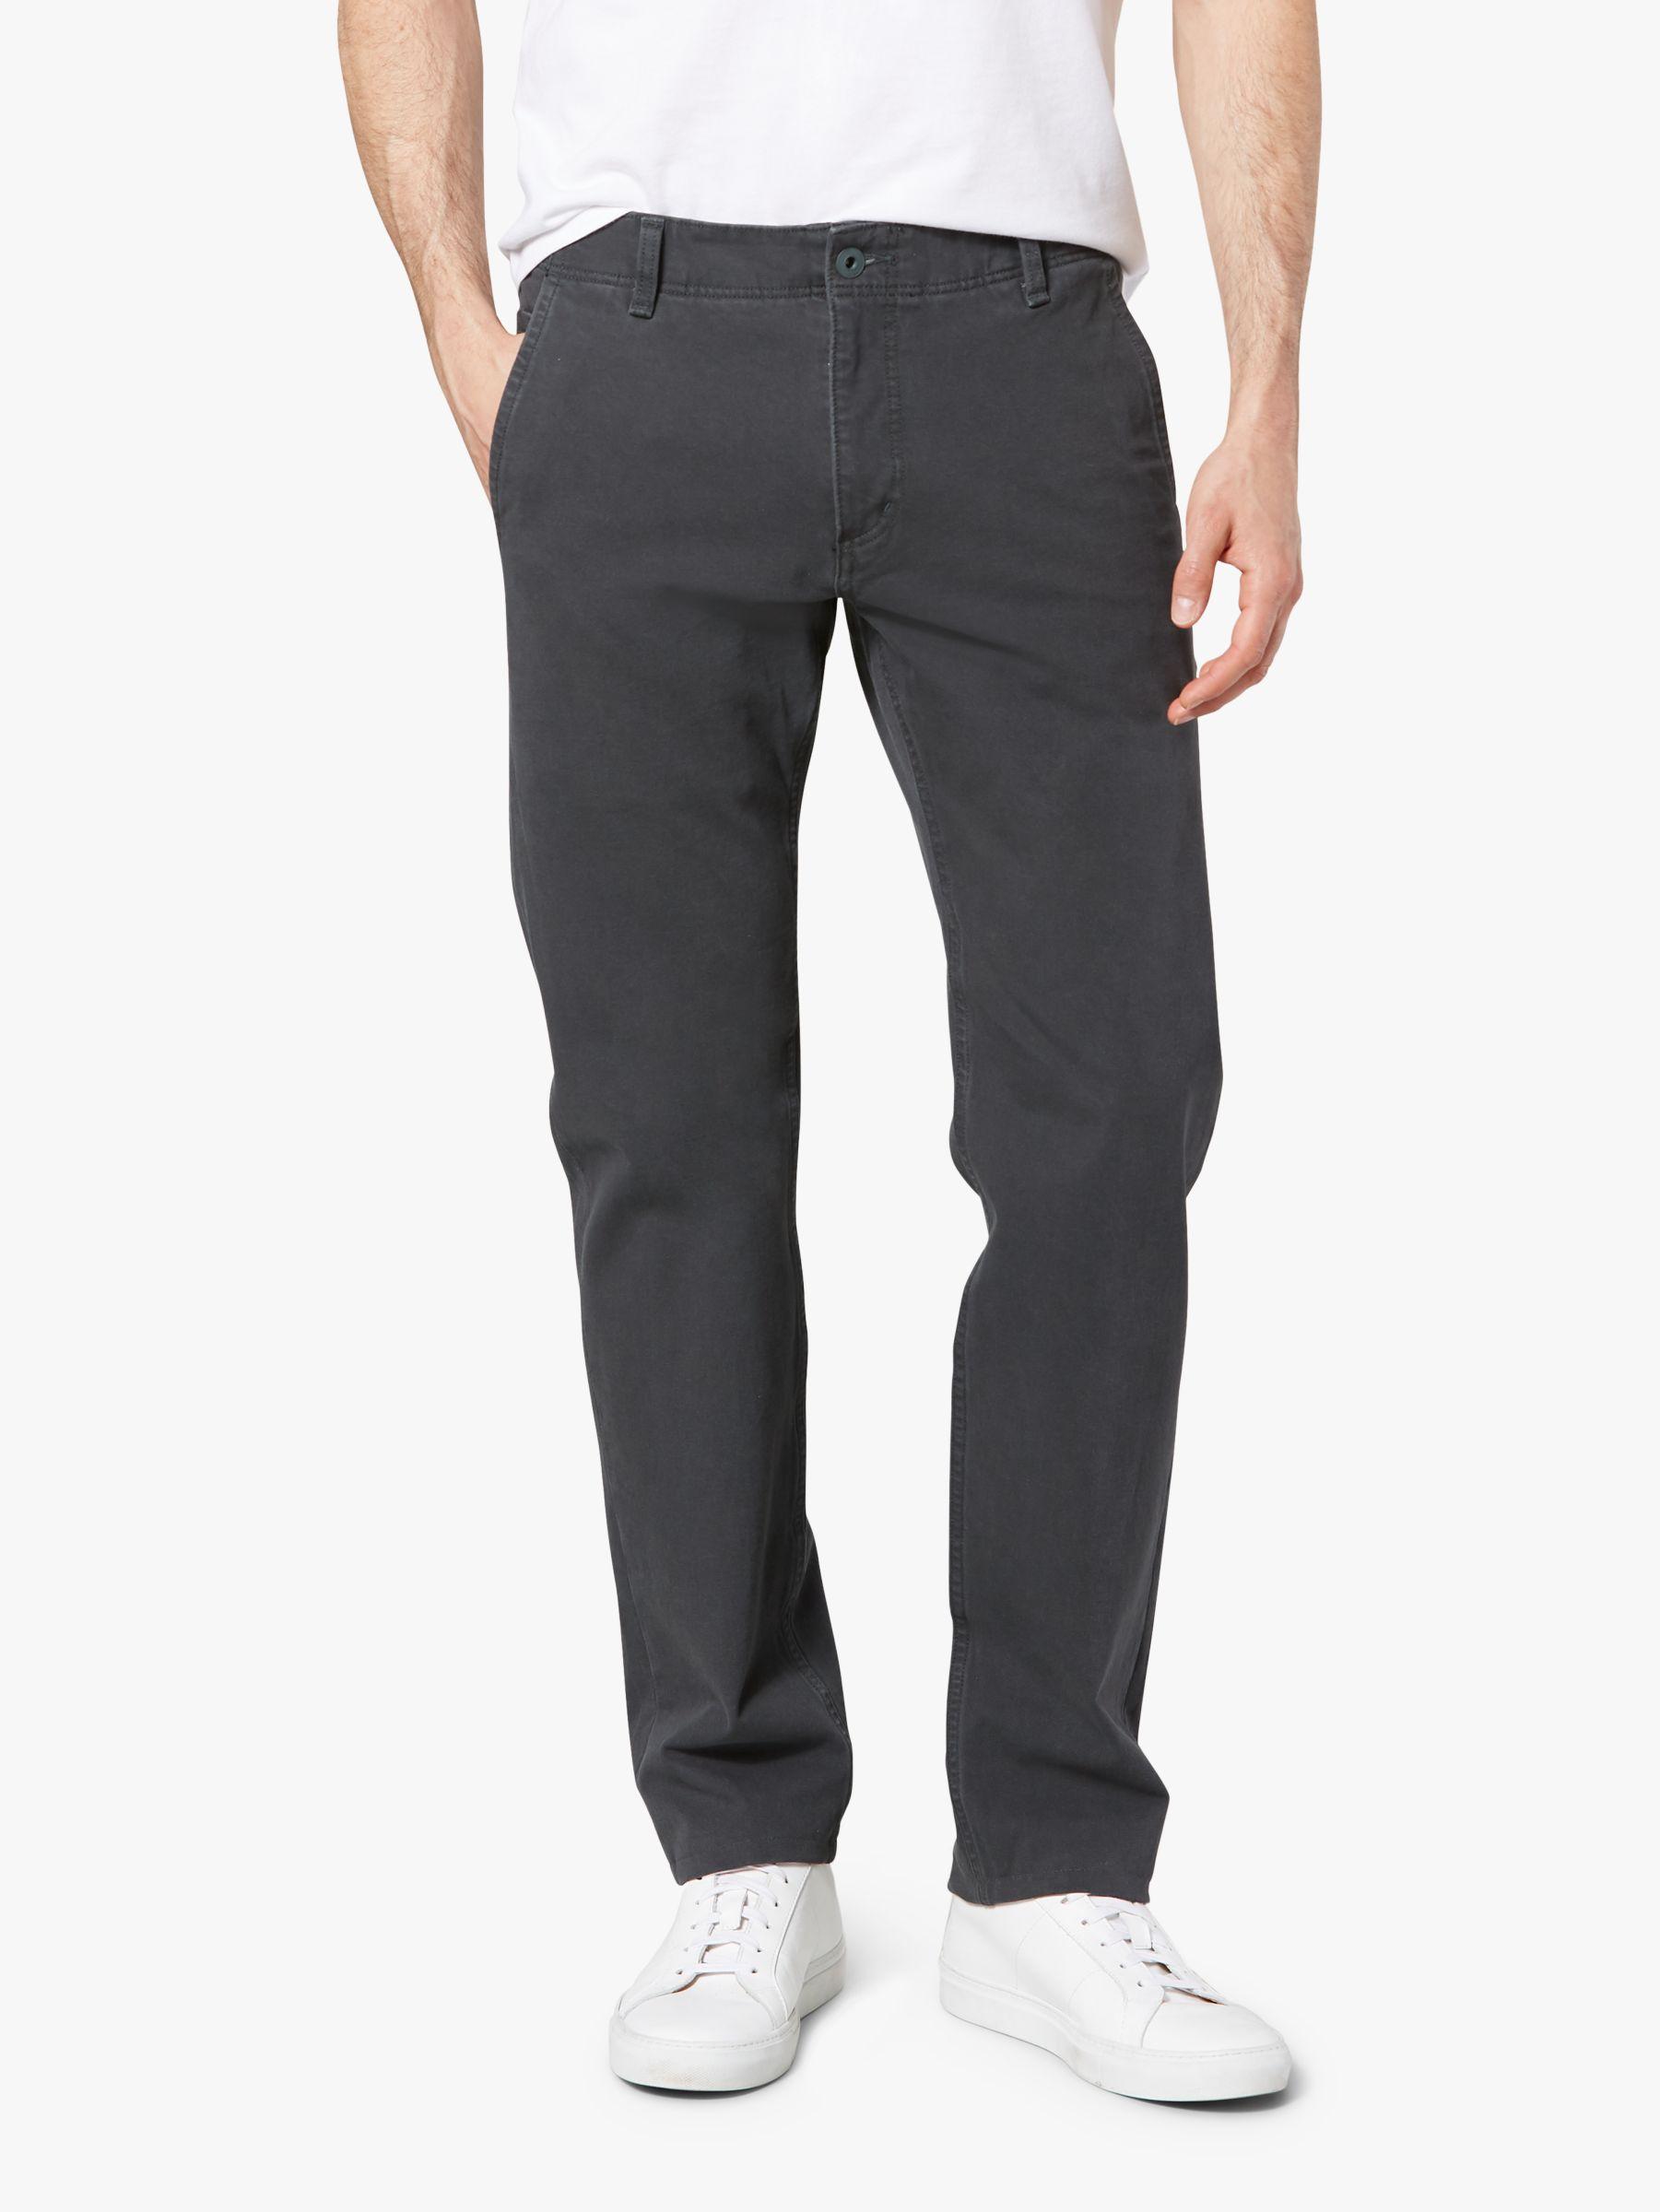 Dockers Dockers Alpha Khaki Smart 360 Flex Slim Tapered Trousers